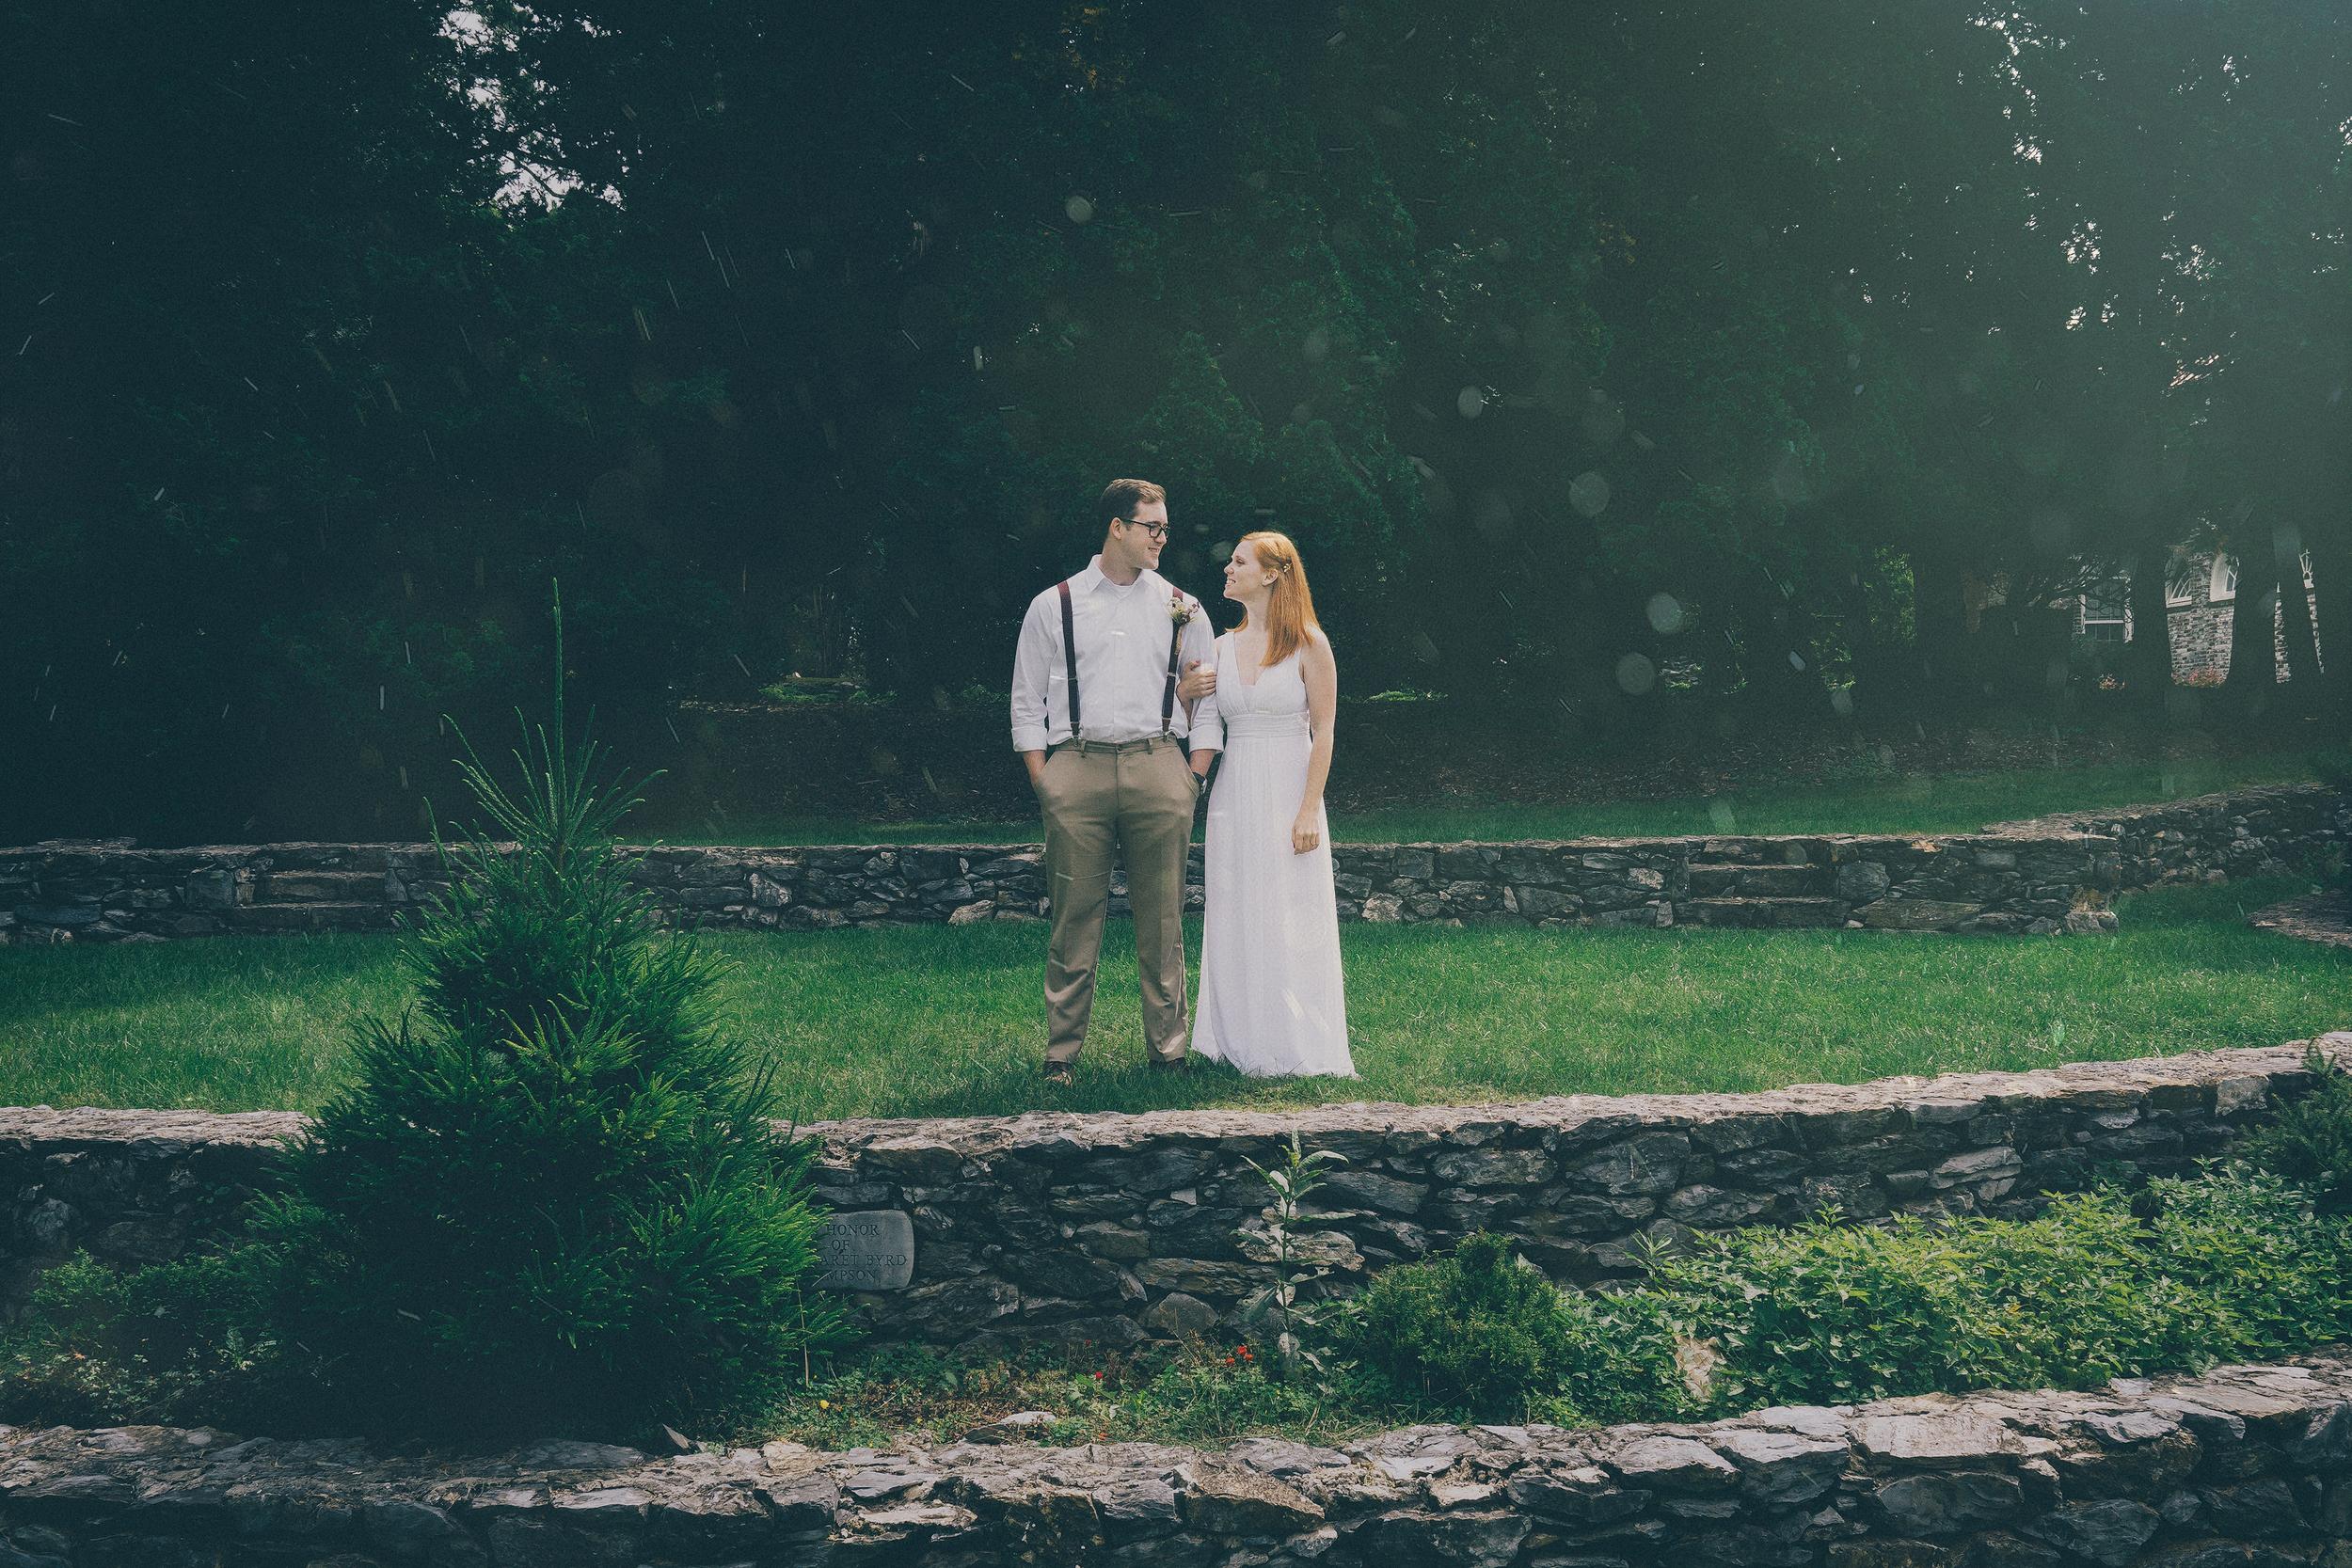 woodland_wedding_taneisha_marie_photography-21.jpg